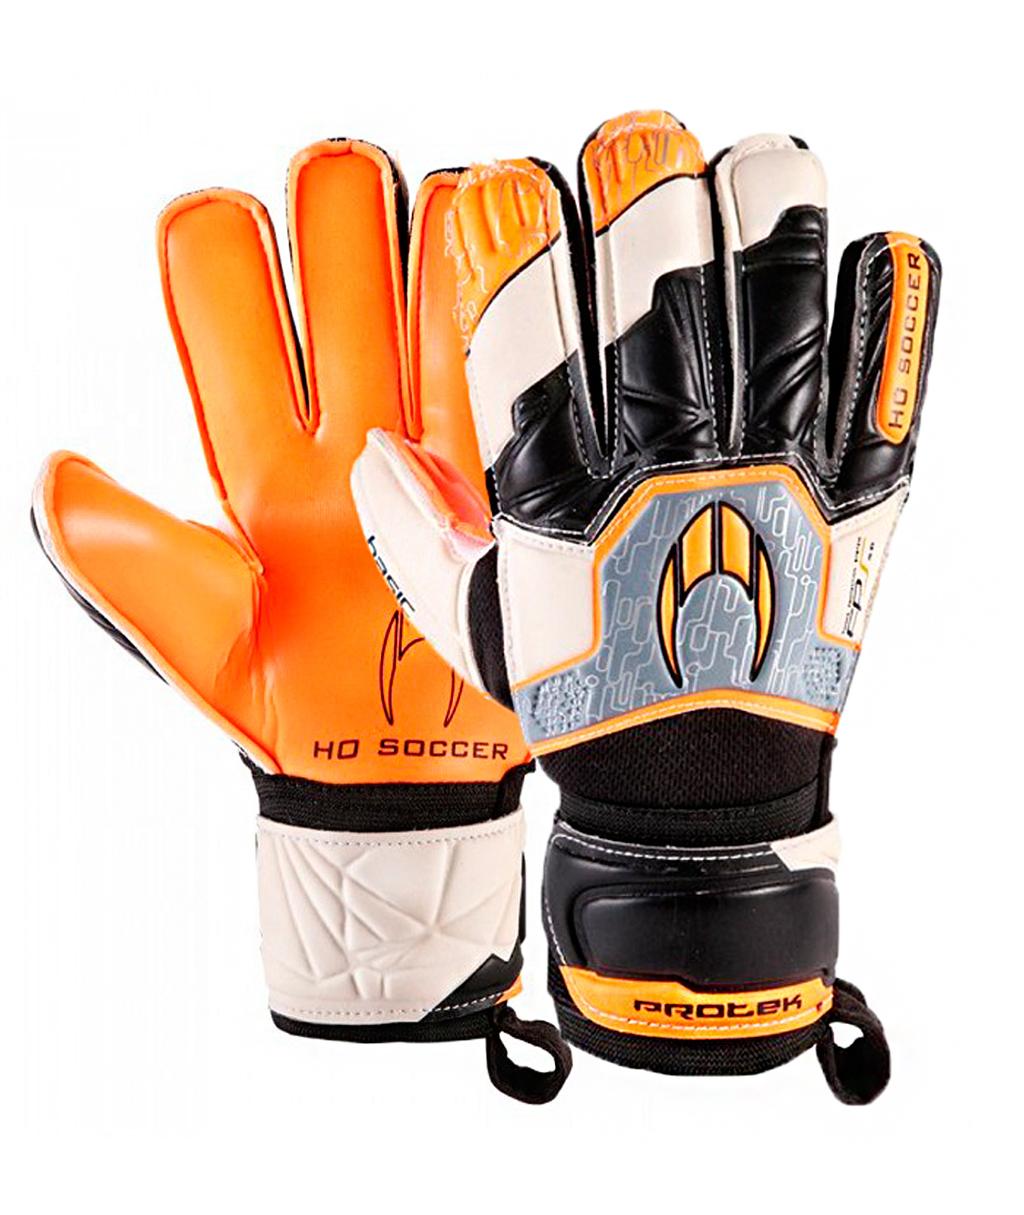 Перчатки HO Soccer Basic Protek Flat Orange Legend 051.0729